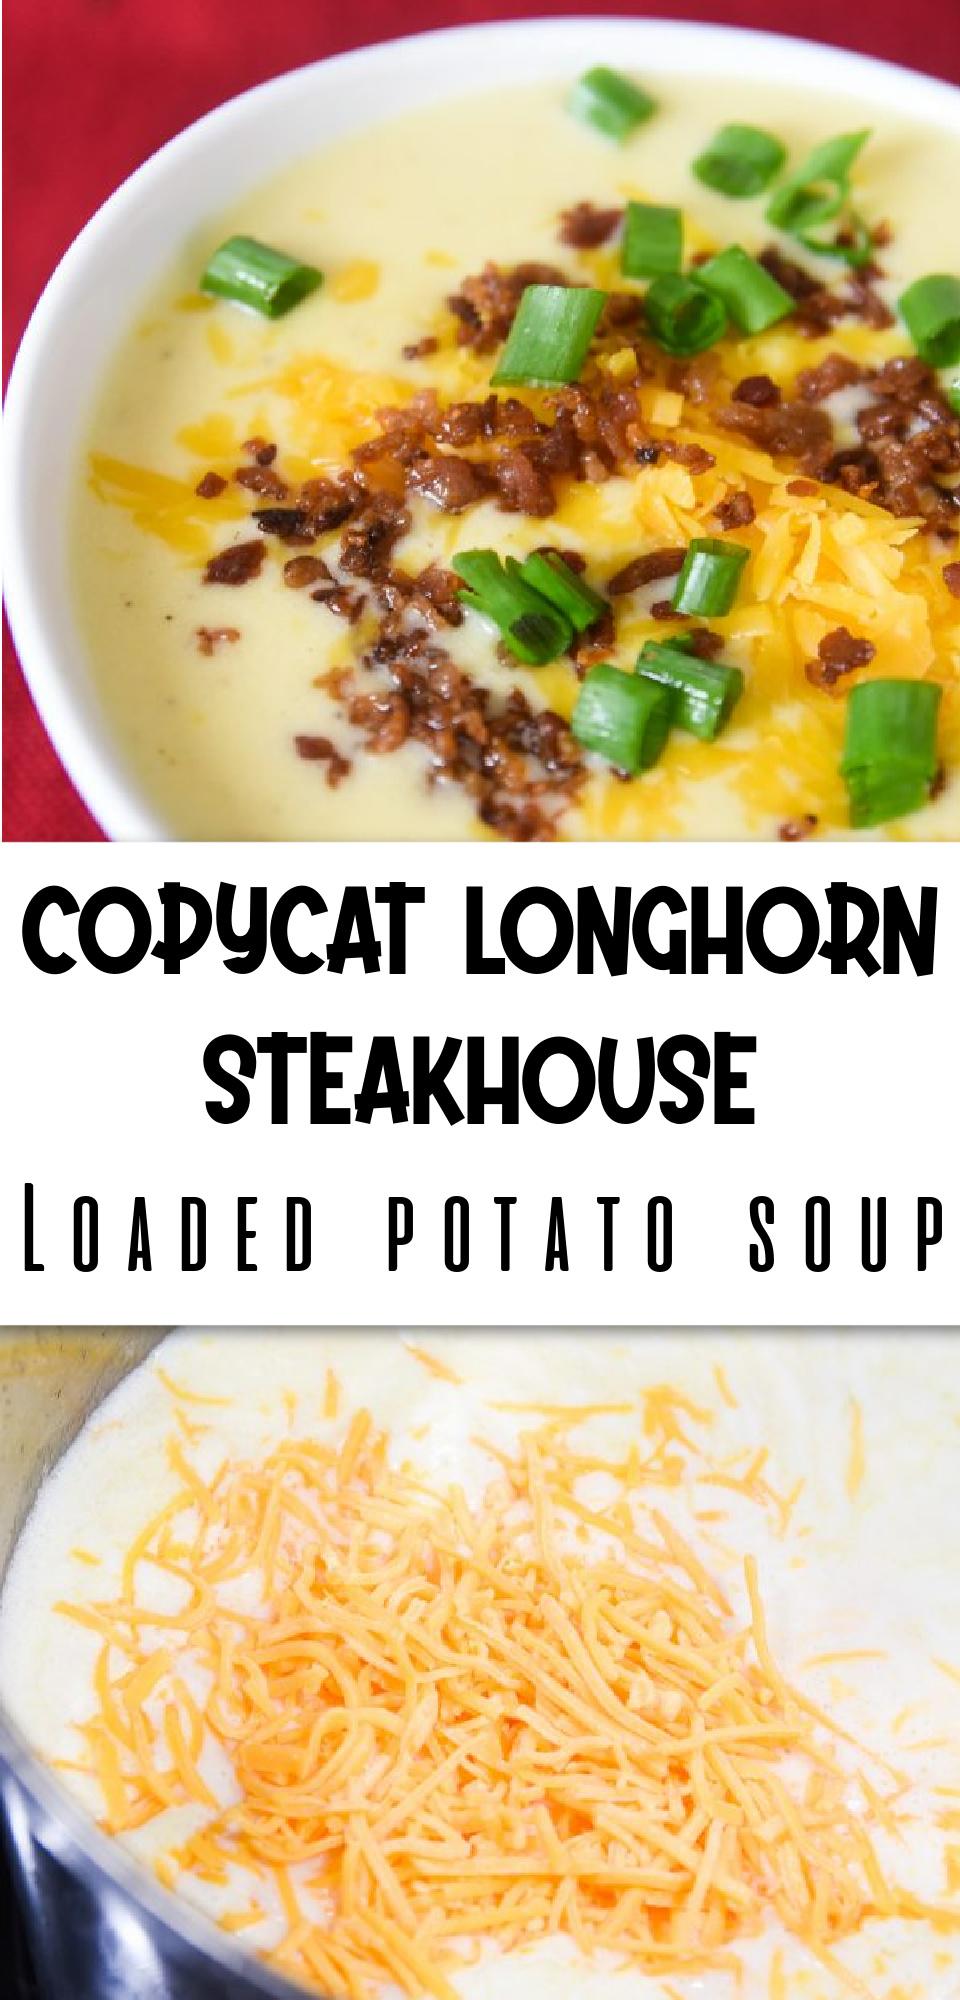 The Best Copycat Longhorn Steakhouse Loaded Potato Soup via @simplysidedishes89